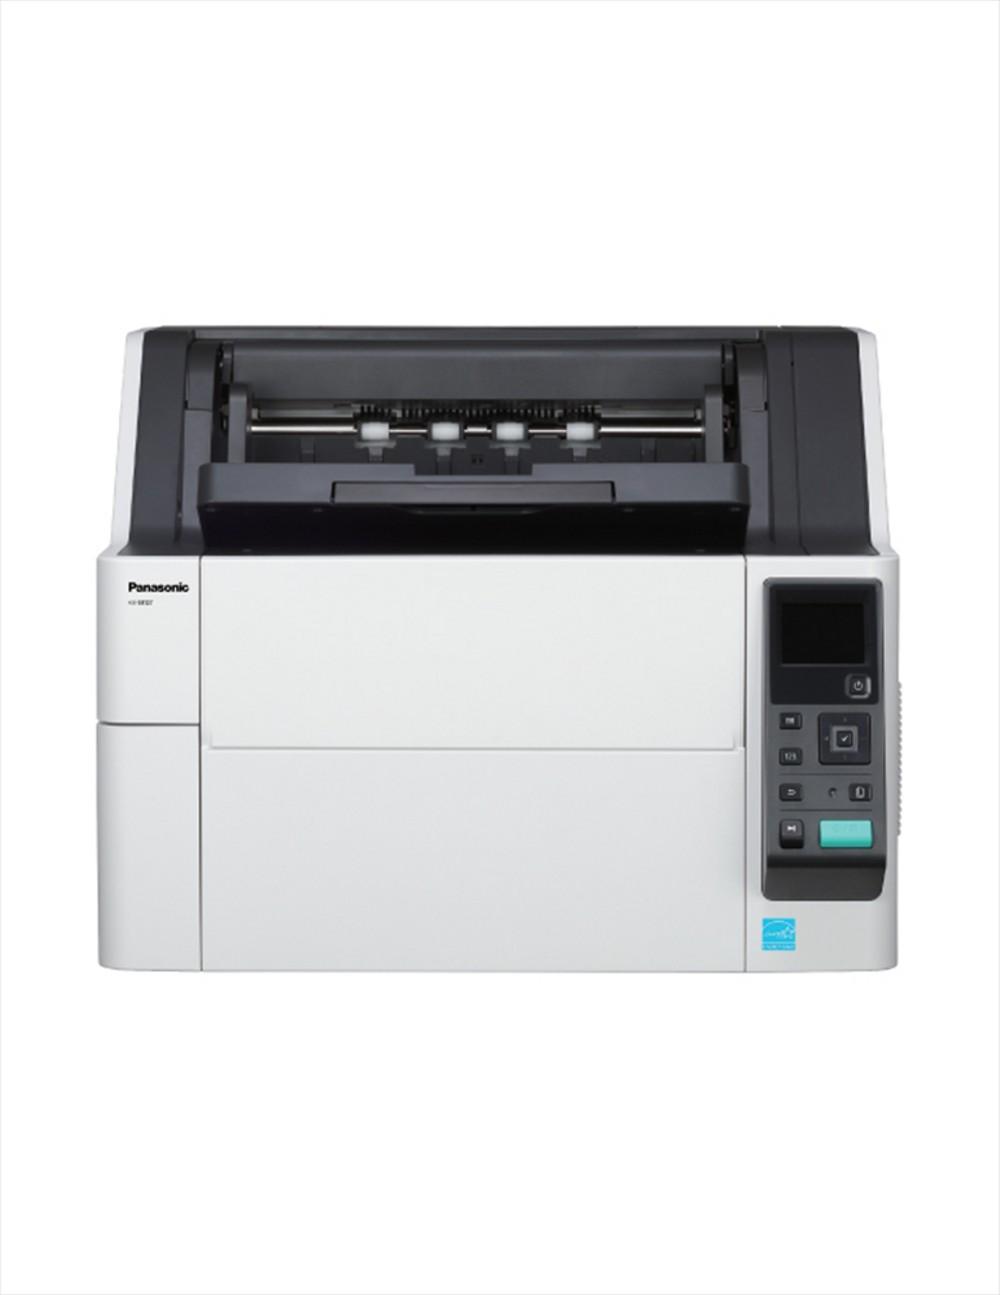 Panasonic KV-S8127 Scanner - Image 2